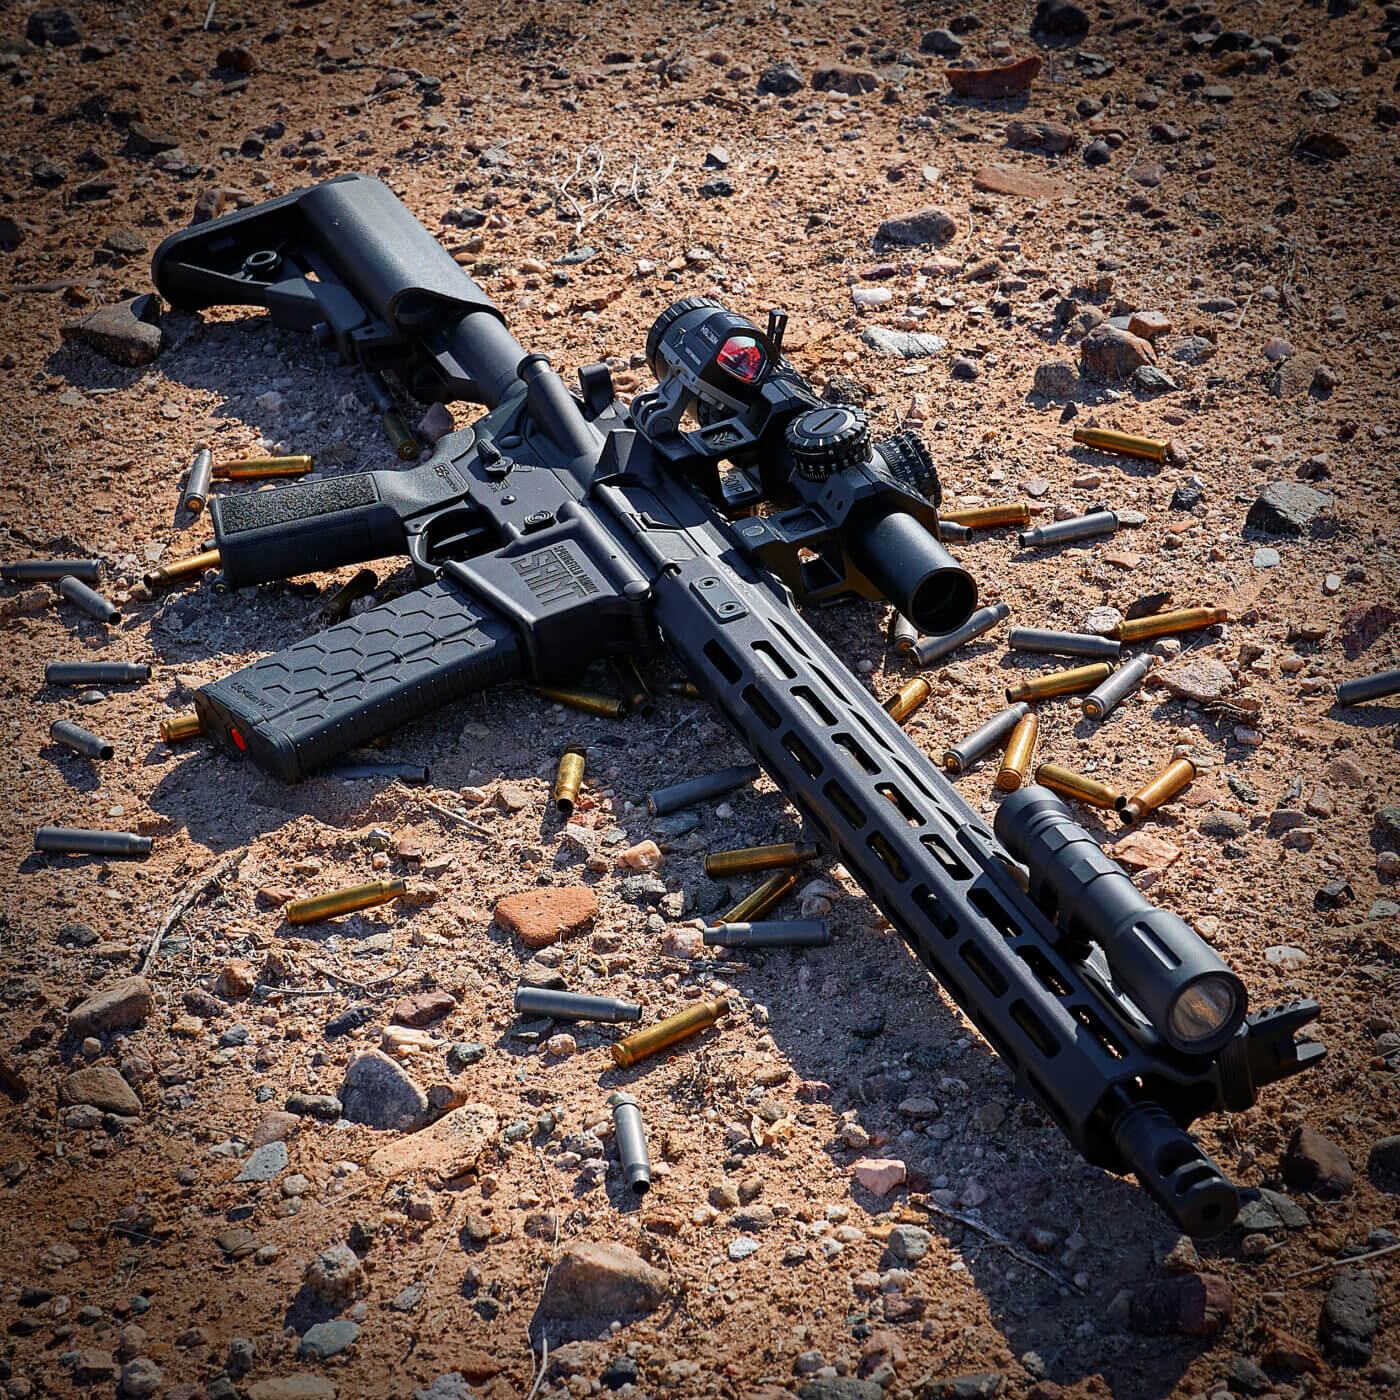 Field testing the Springfield SAINT rifle with Tula Russian ammo